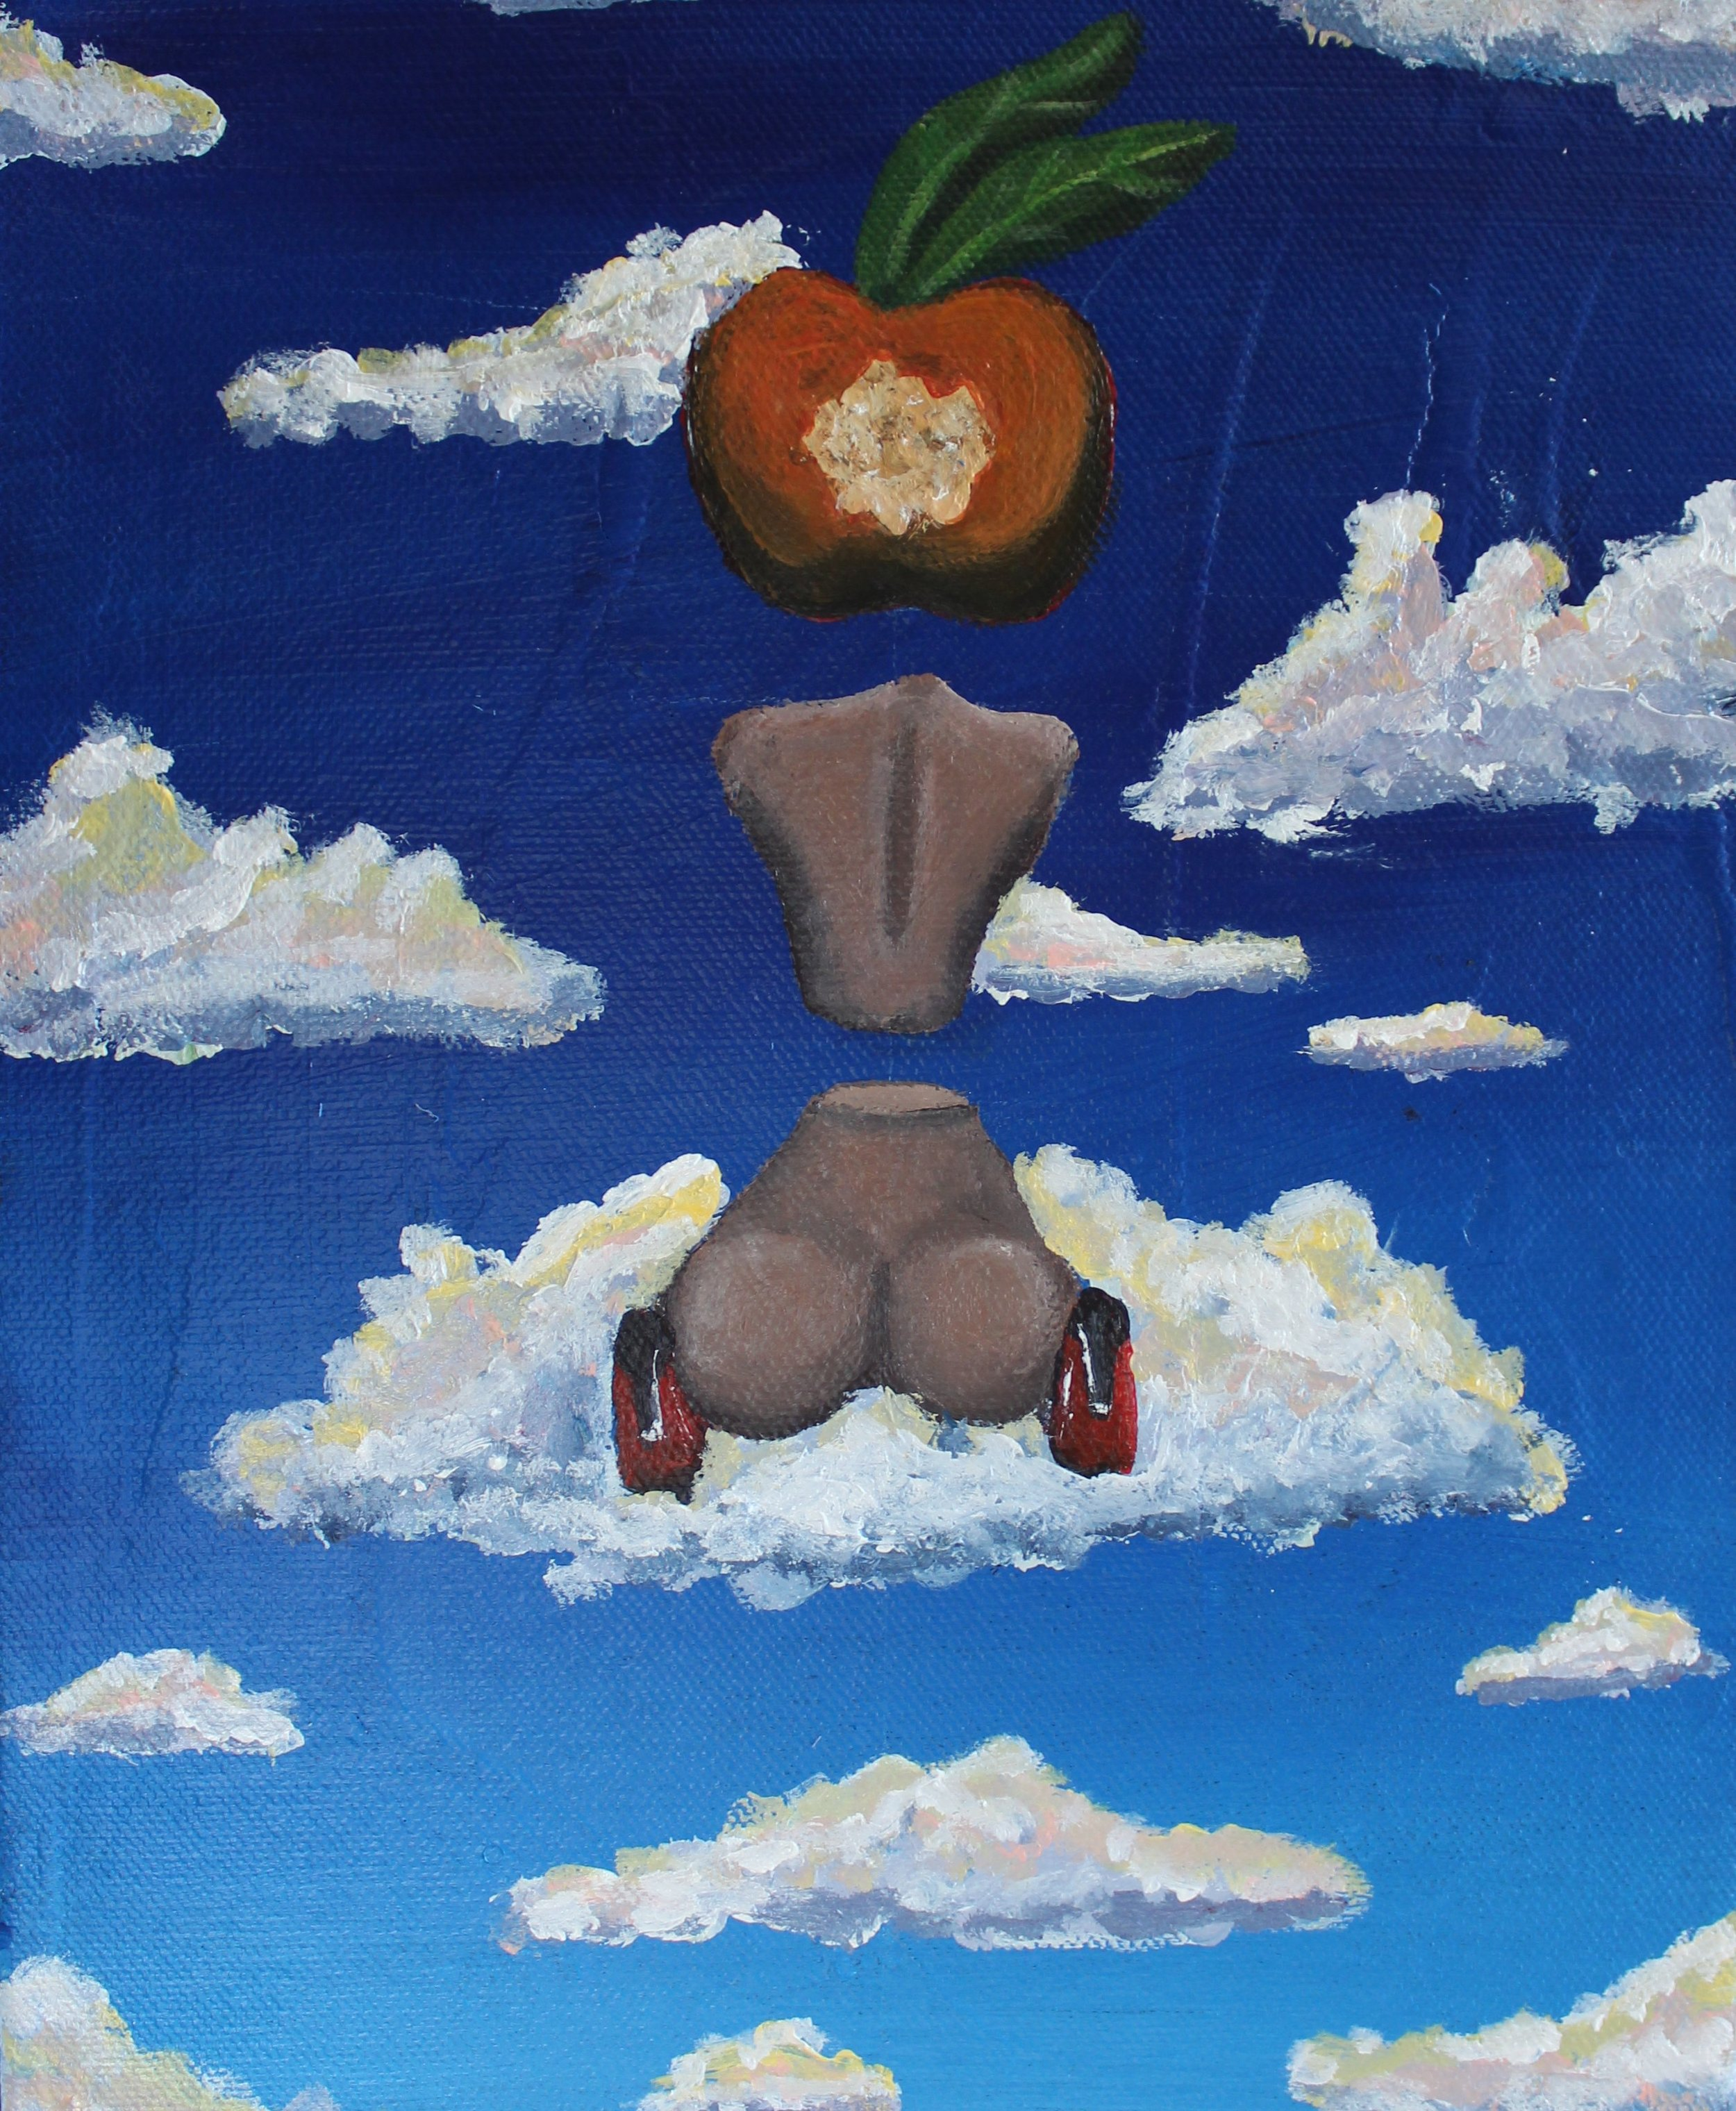 Abi Salami -Designer Whores III - Acrylic on canvas - 10H 8W 1.5D- 2018 - $250.jpg.jpg